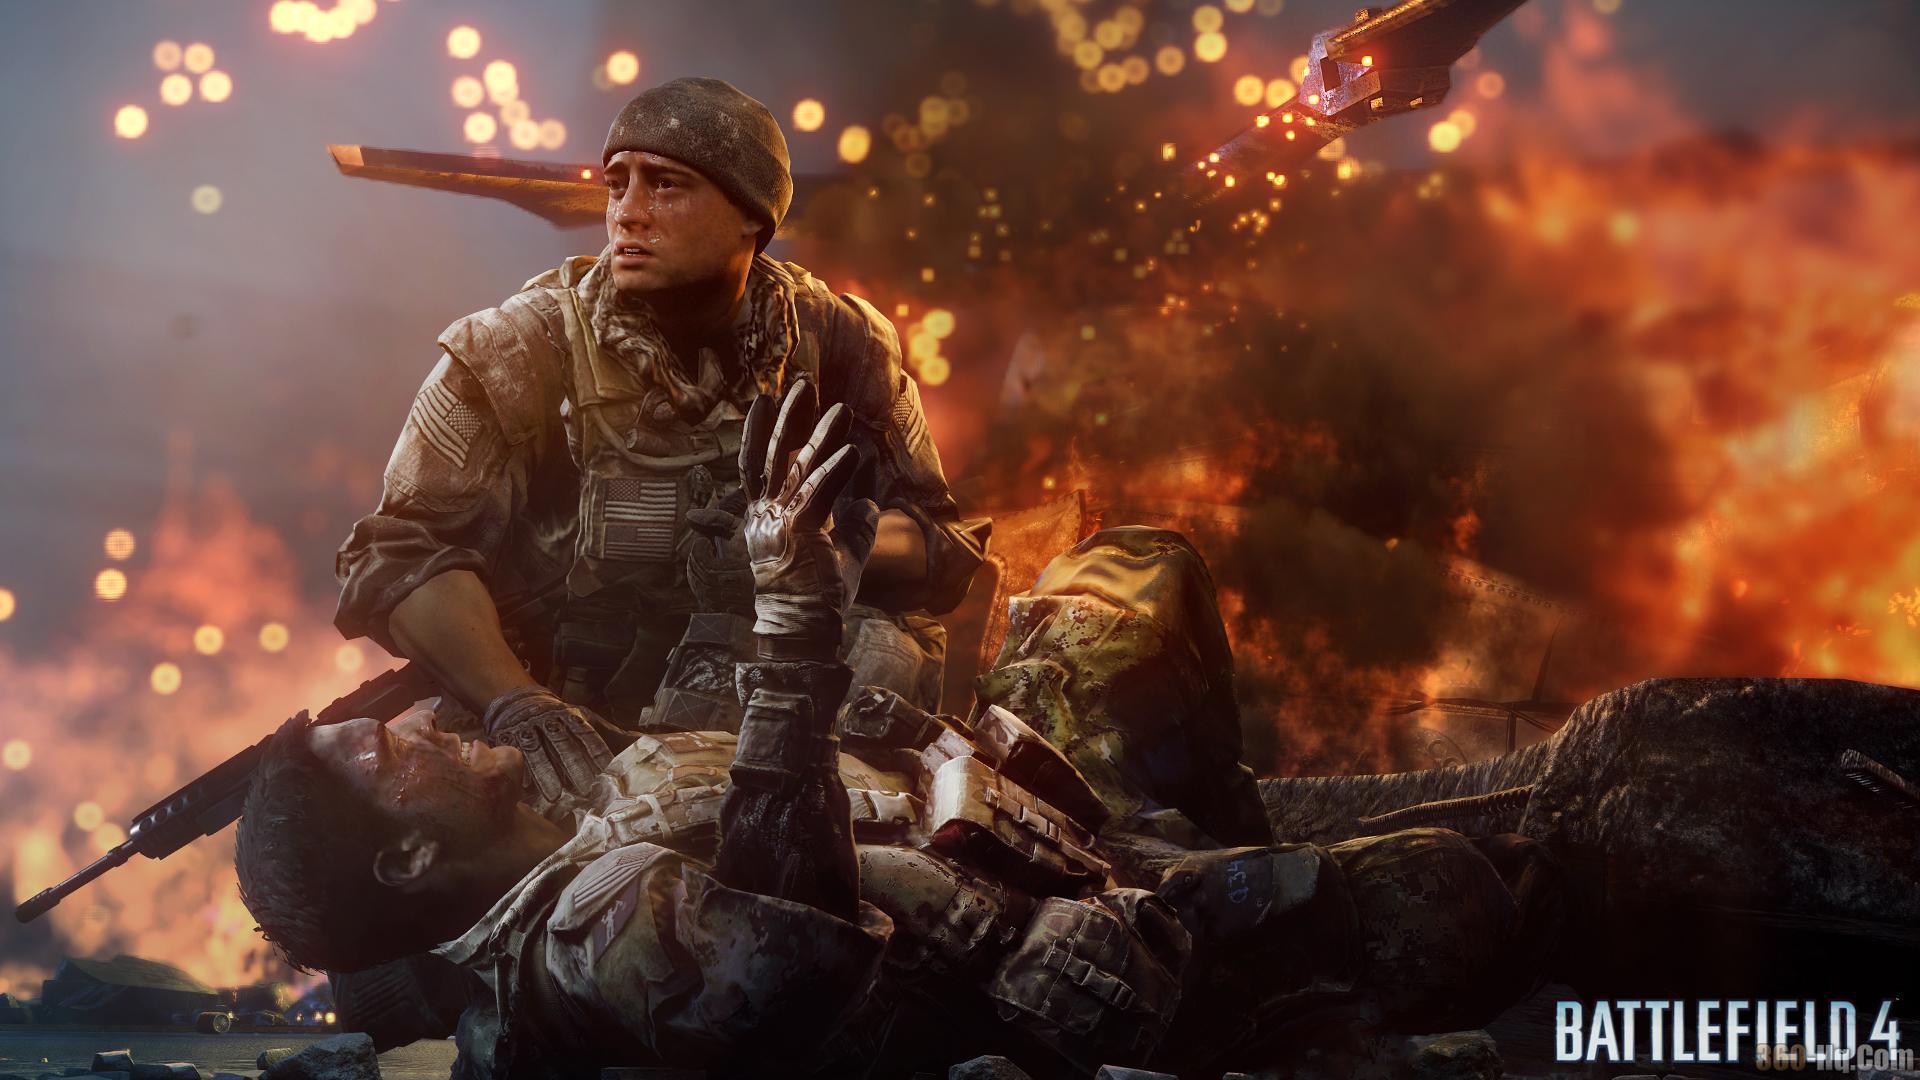 Battlefield 4 Xbox 360 Screenshot 27501